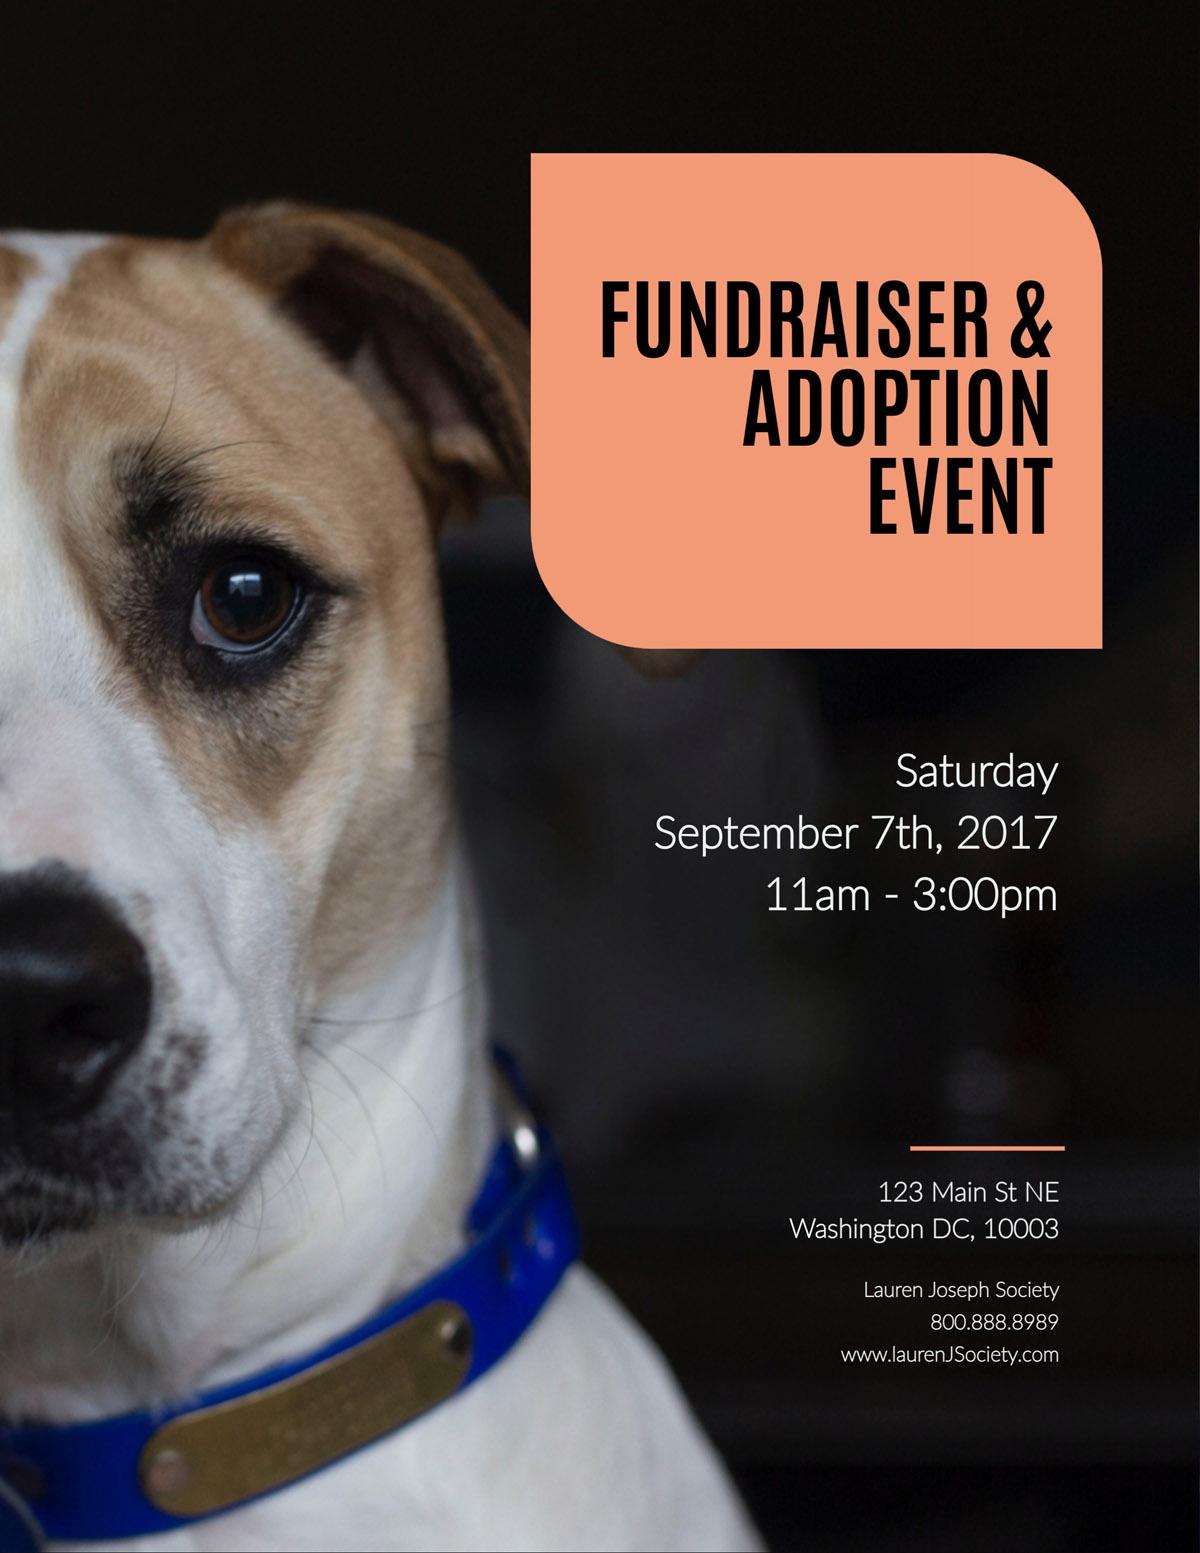 flyer templates - nonprofit adoption fundraiser